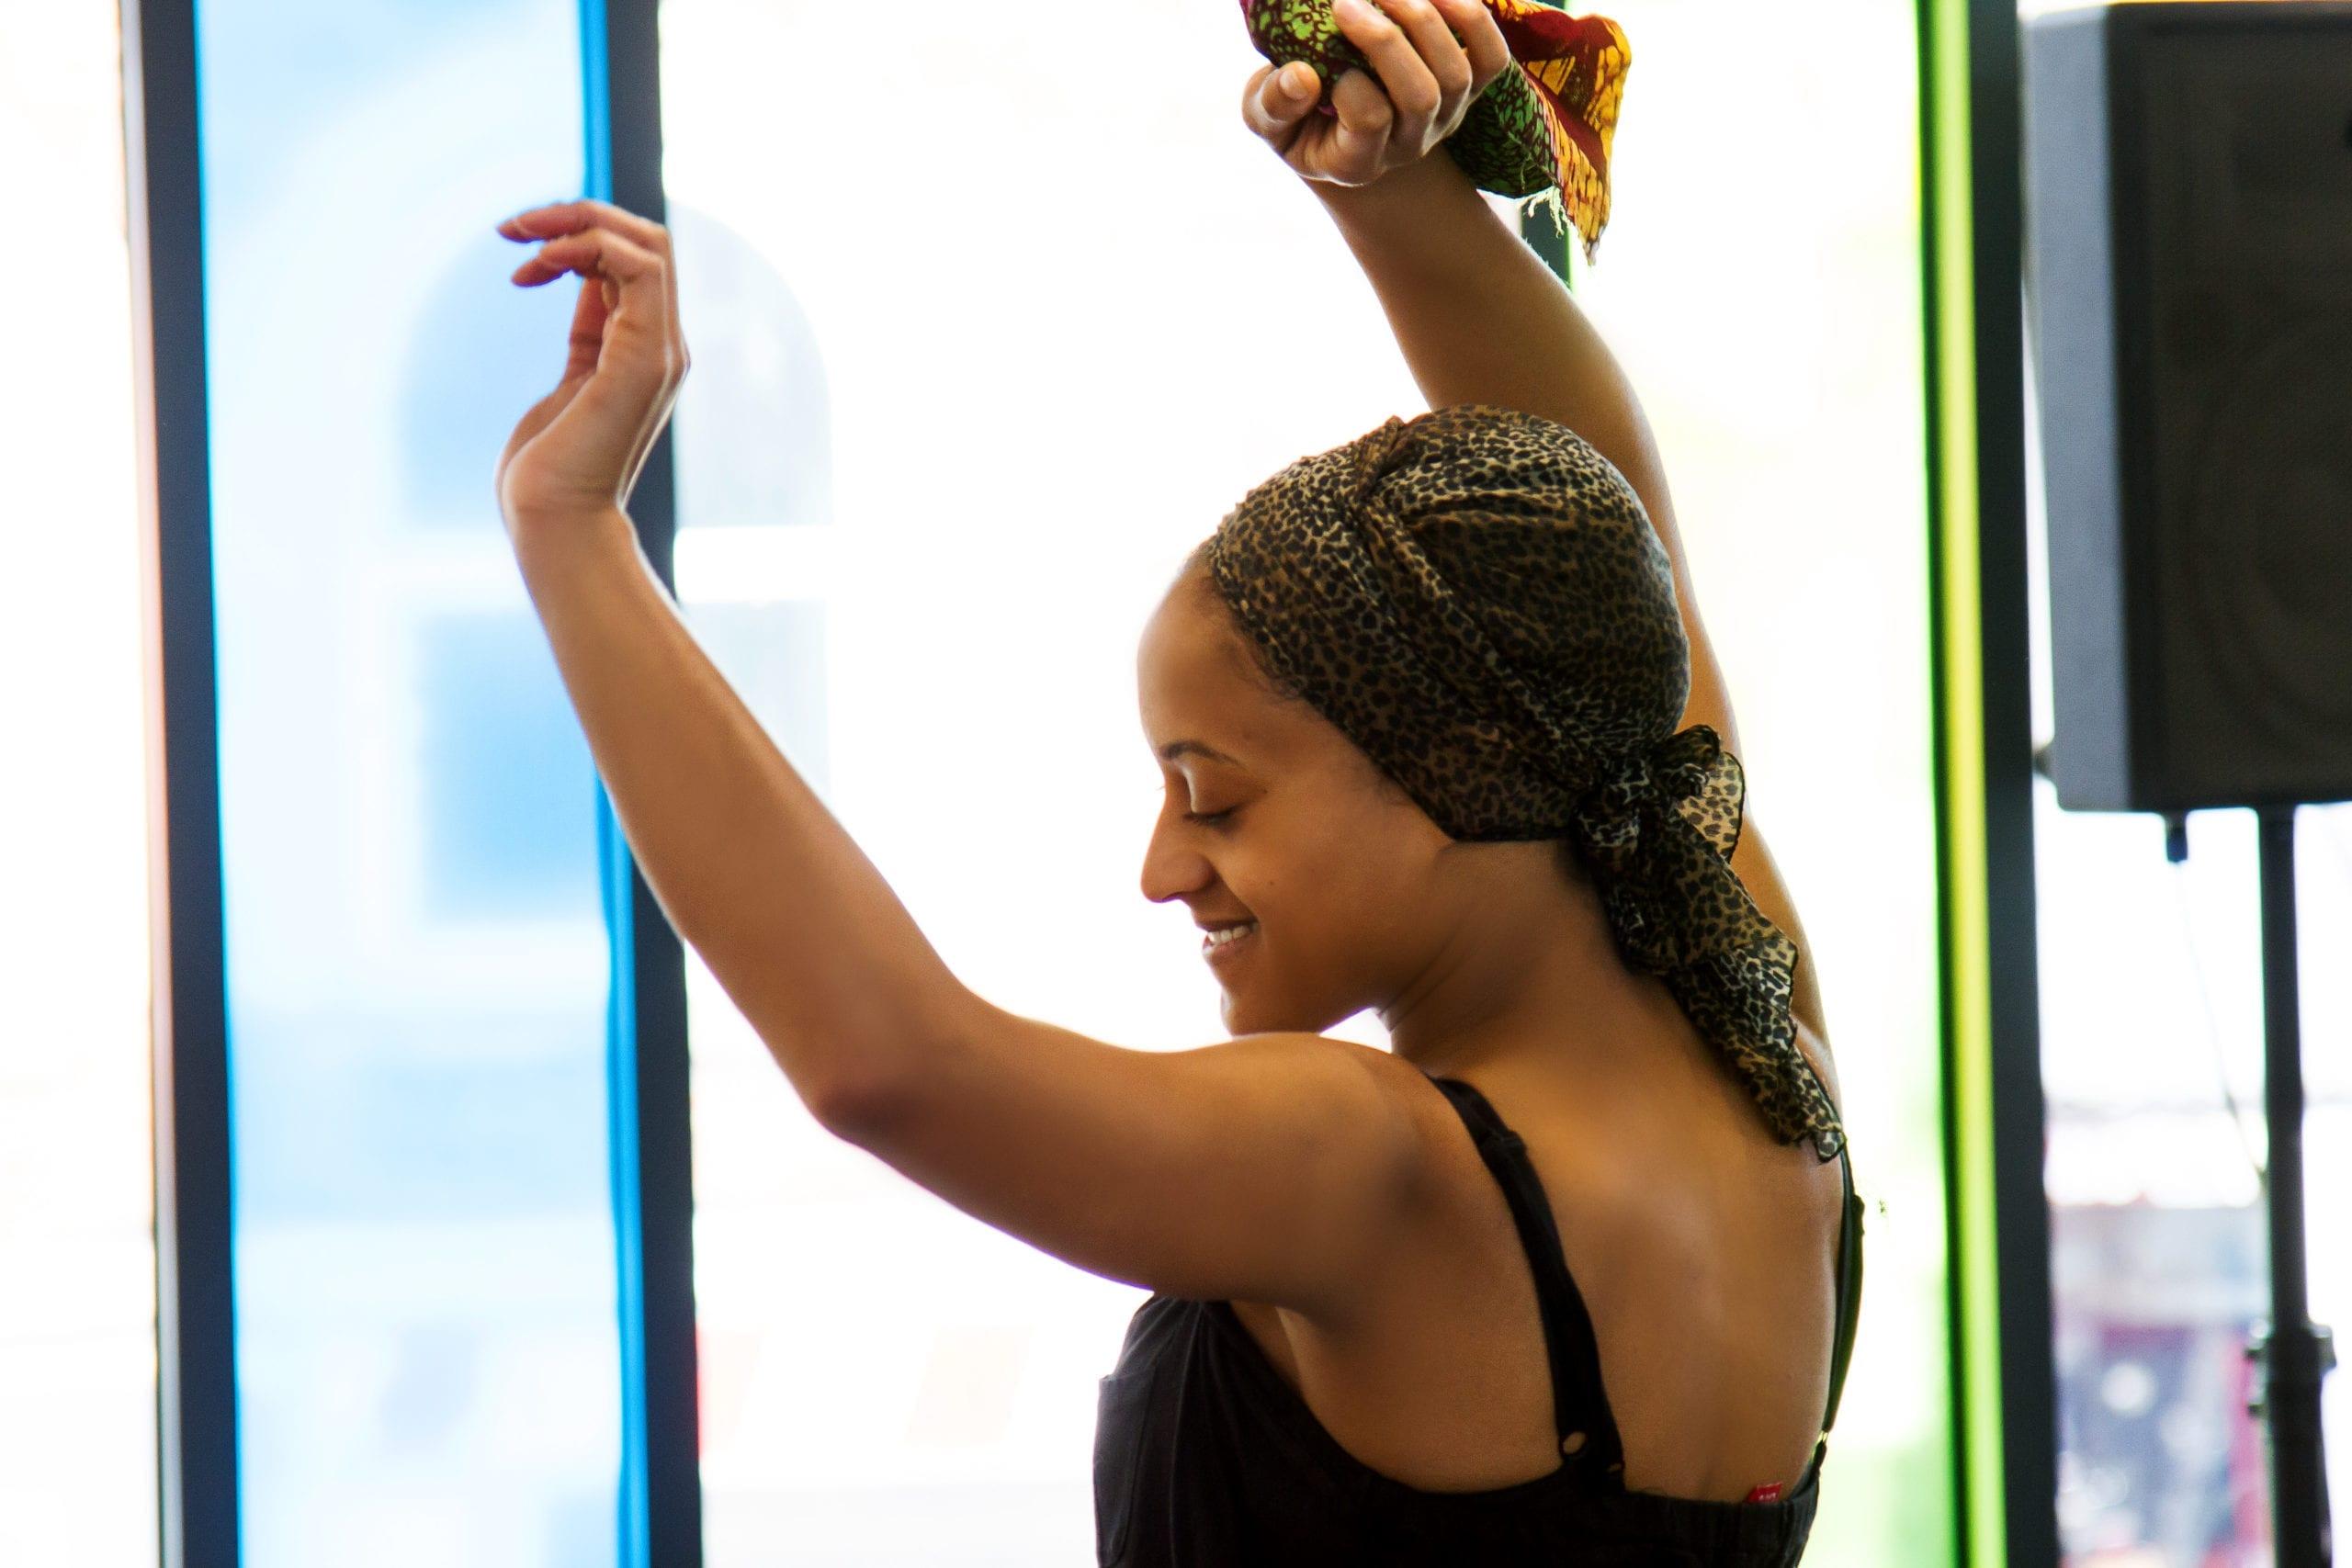 A dancer performs at a Lyrici event